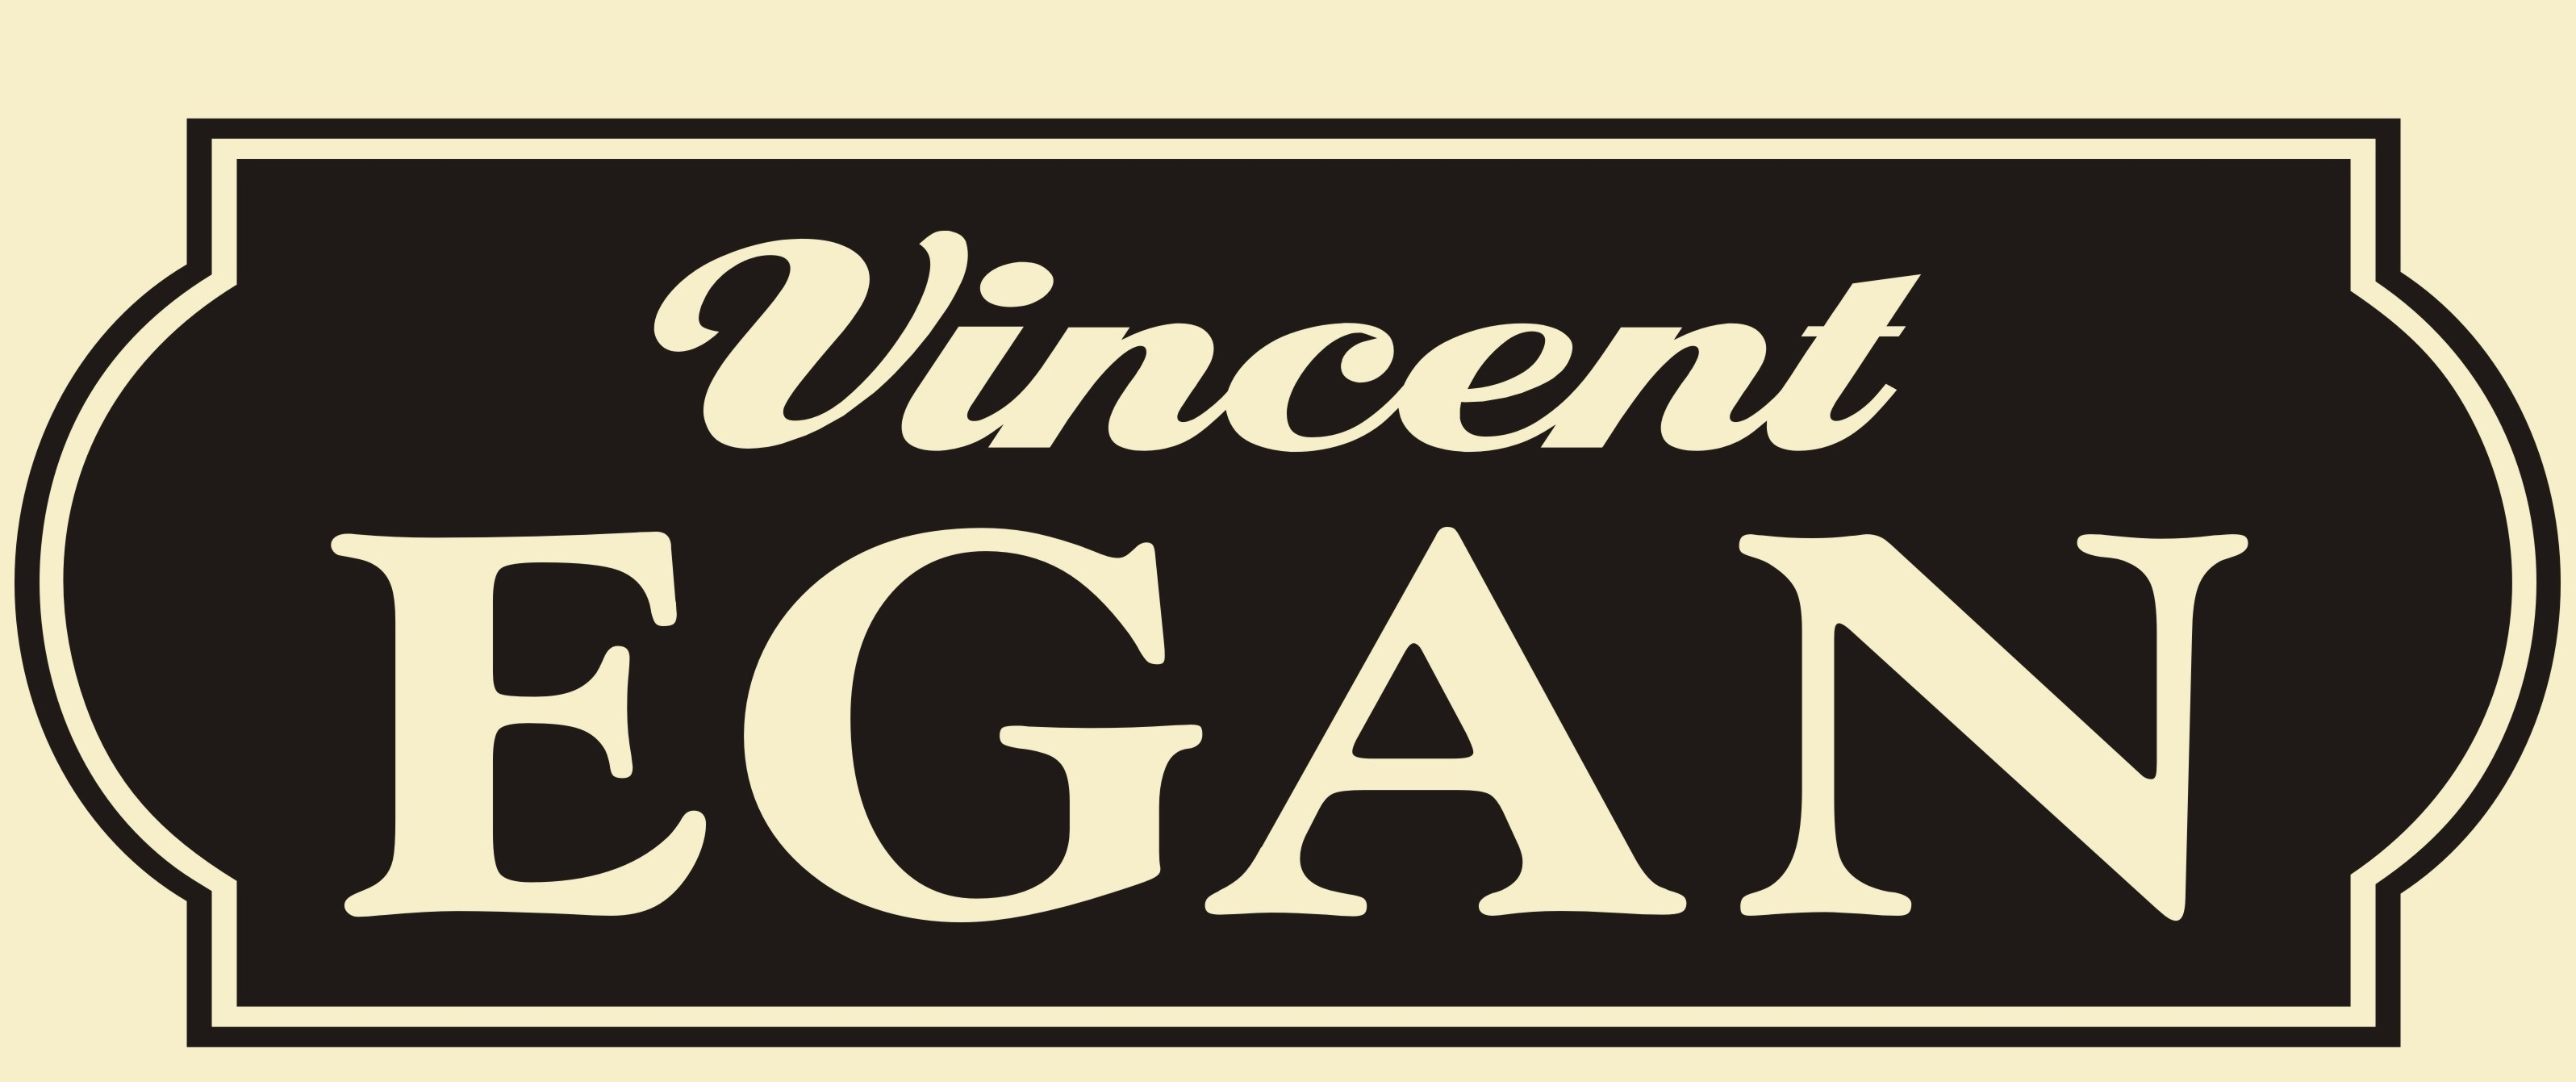 Vincent Egan Auctioneers